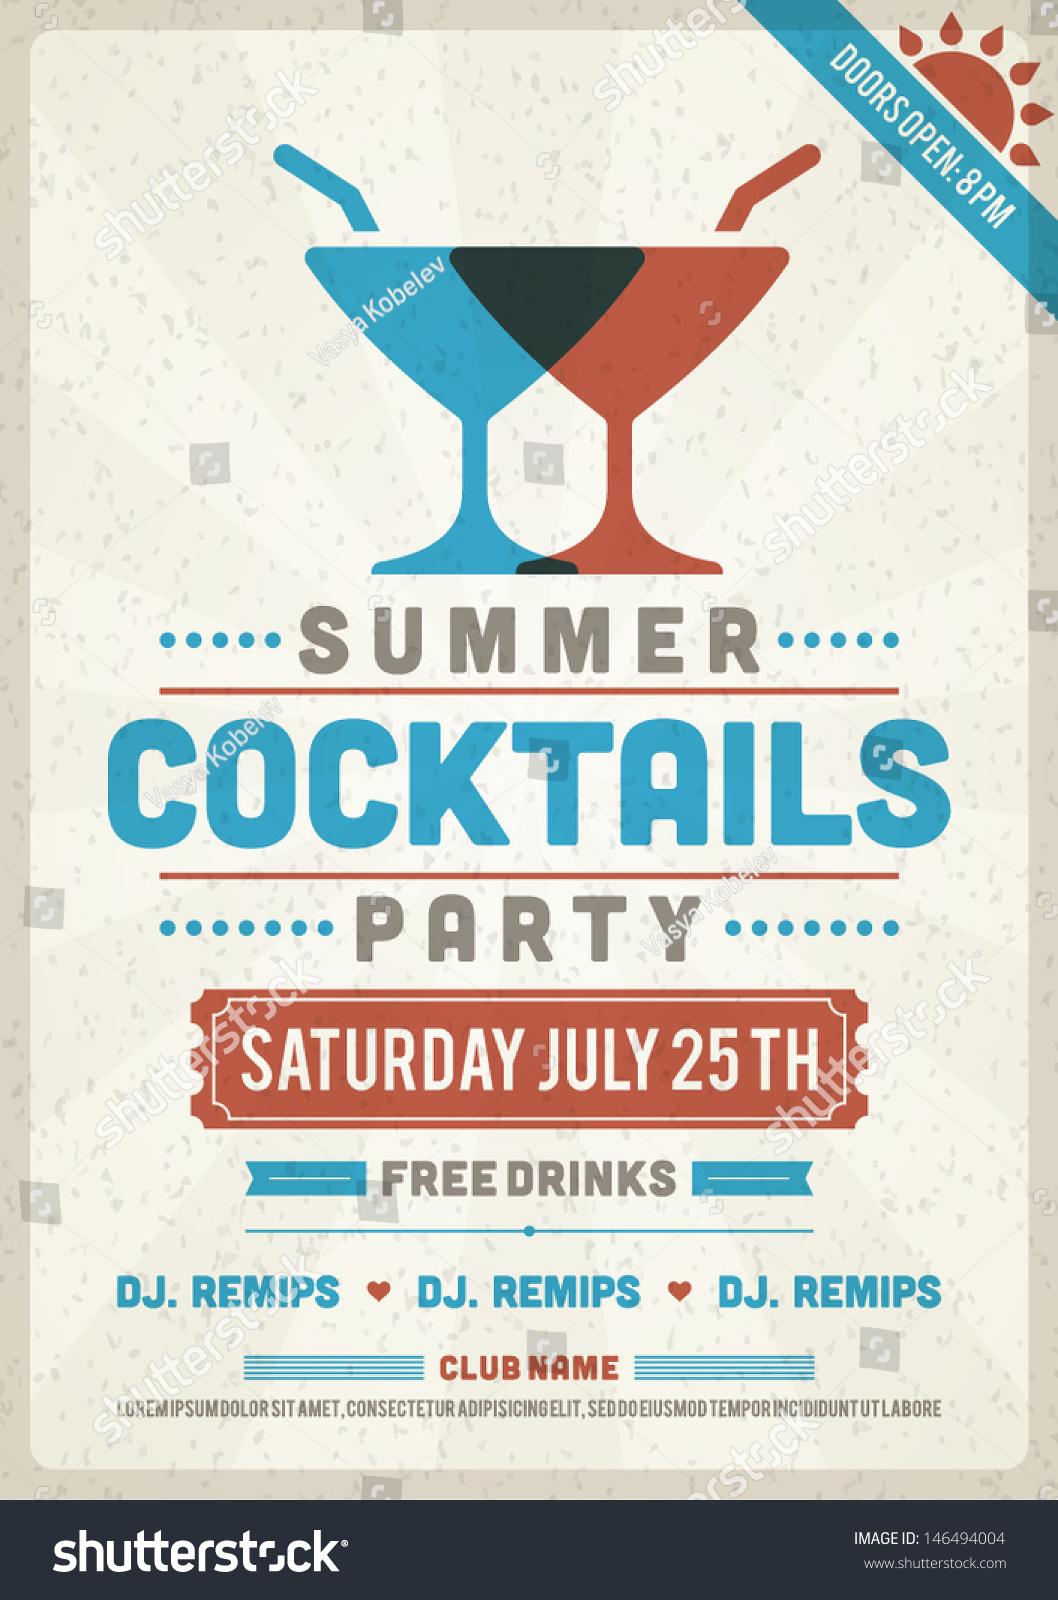 retro summer party design poster flyer stock vector 146494004 shutterstock. Black Bedroom Furniture Sets. Home Design Ideas